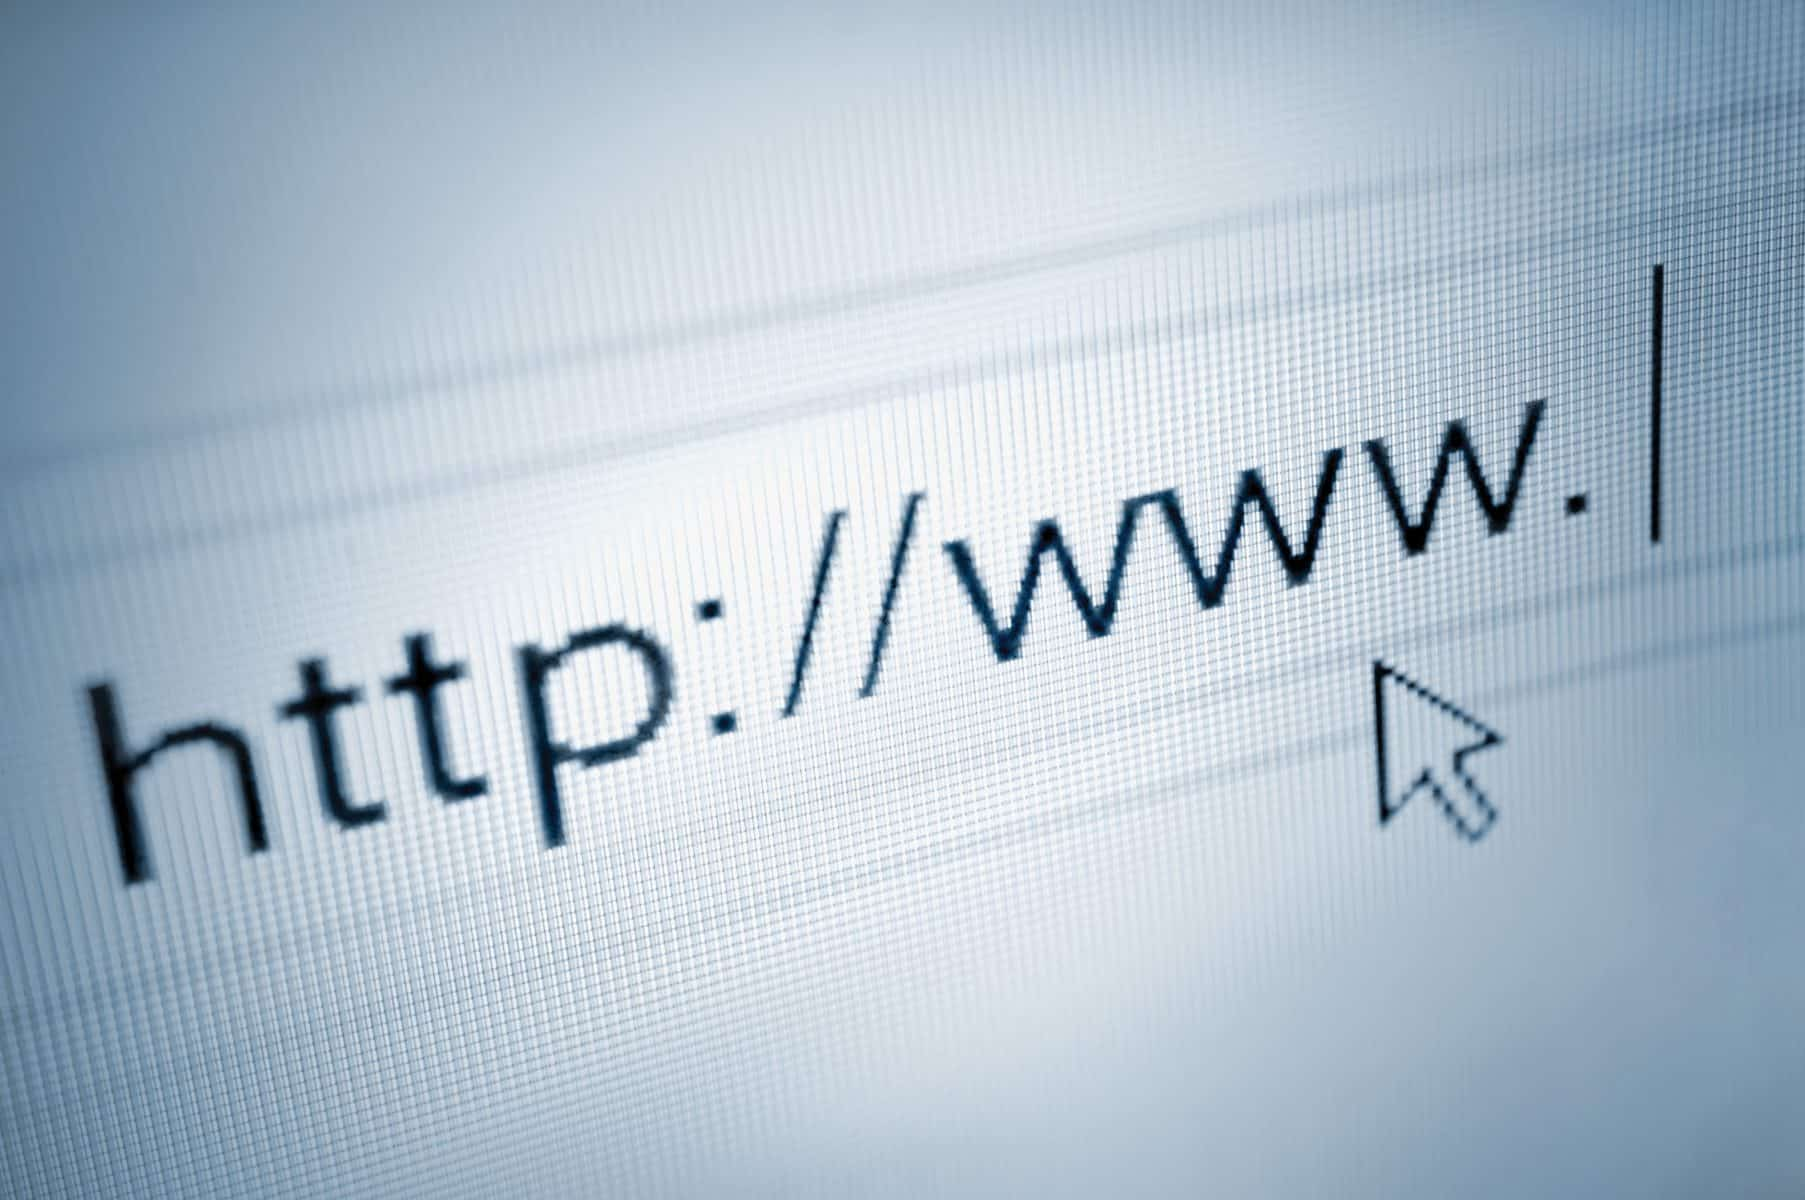 URL up close